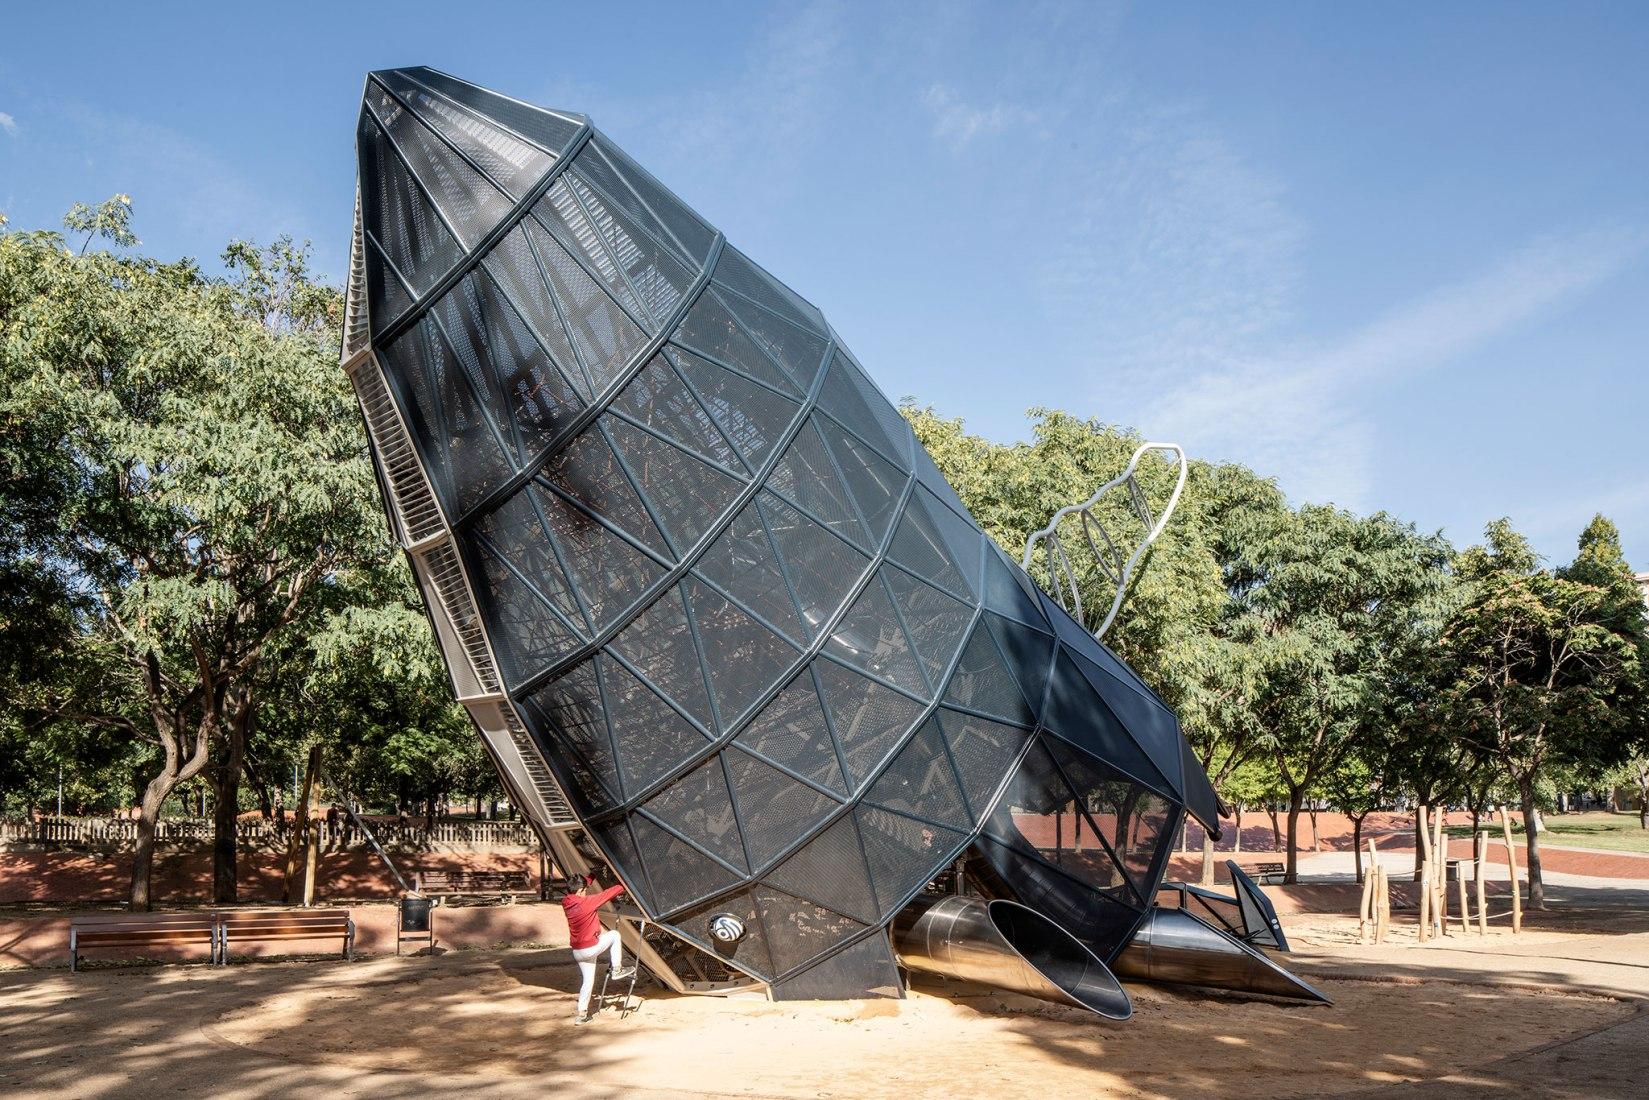 Balena playground in Nou Barris Central Park by Queralt Suau. Photograph by Txema Salvans